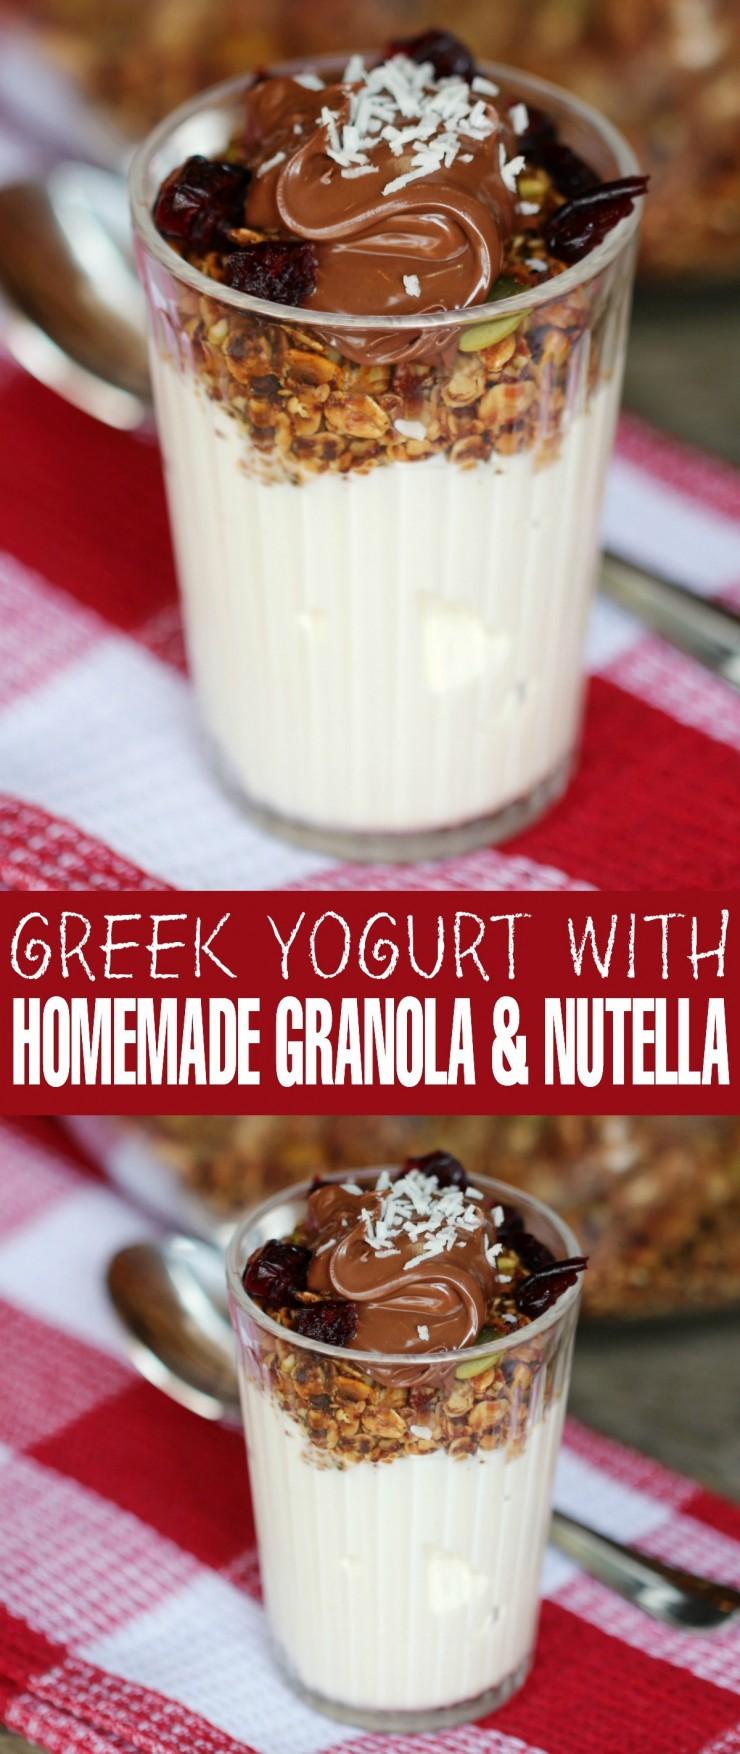 Greek-Yogurt-Homemade-Granola-and-Nutella